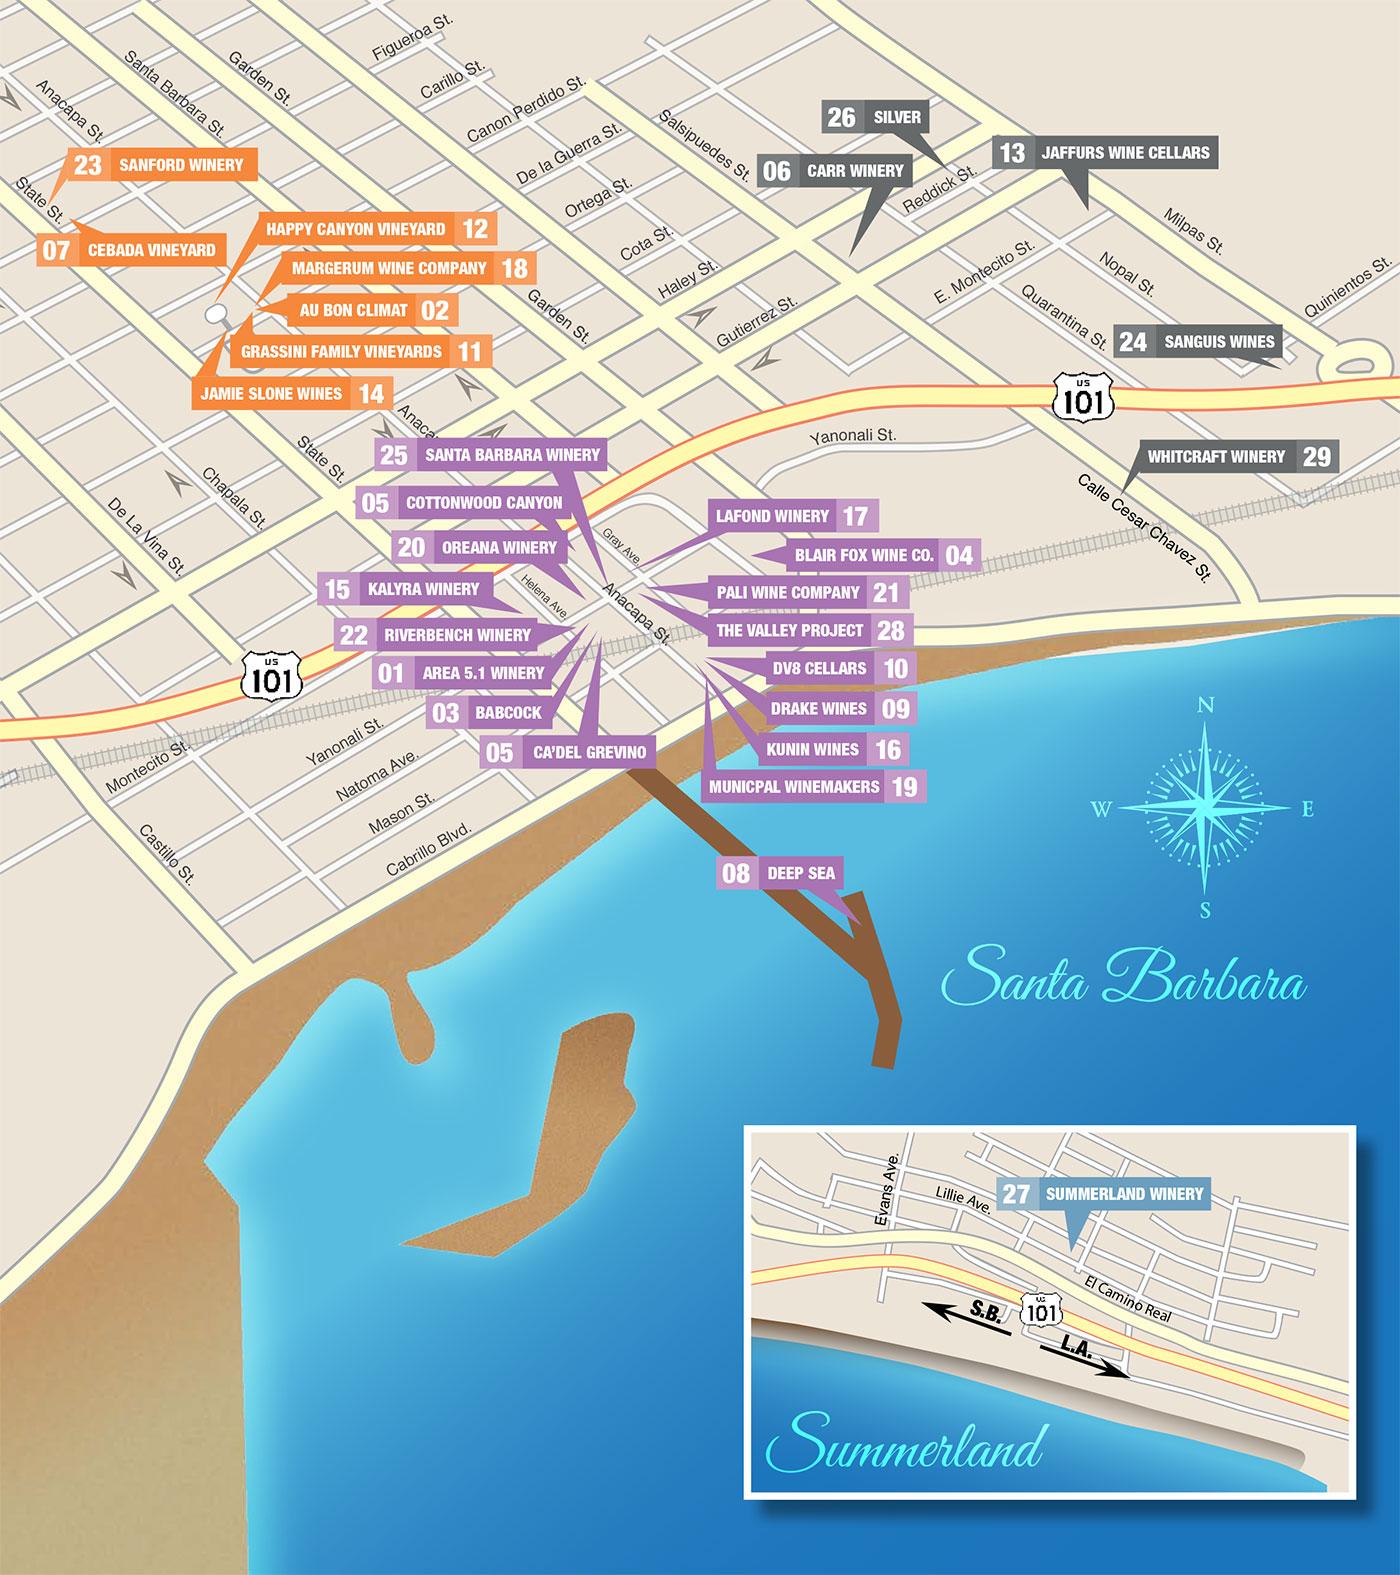 Urban Wine Trail riskin partners montecito wineries